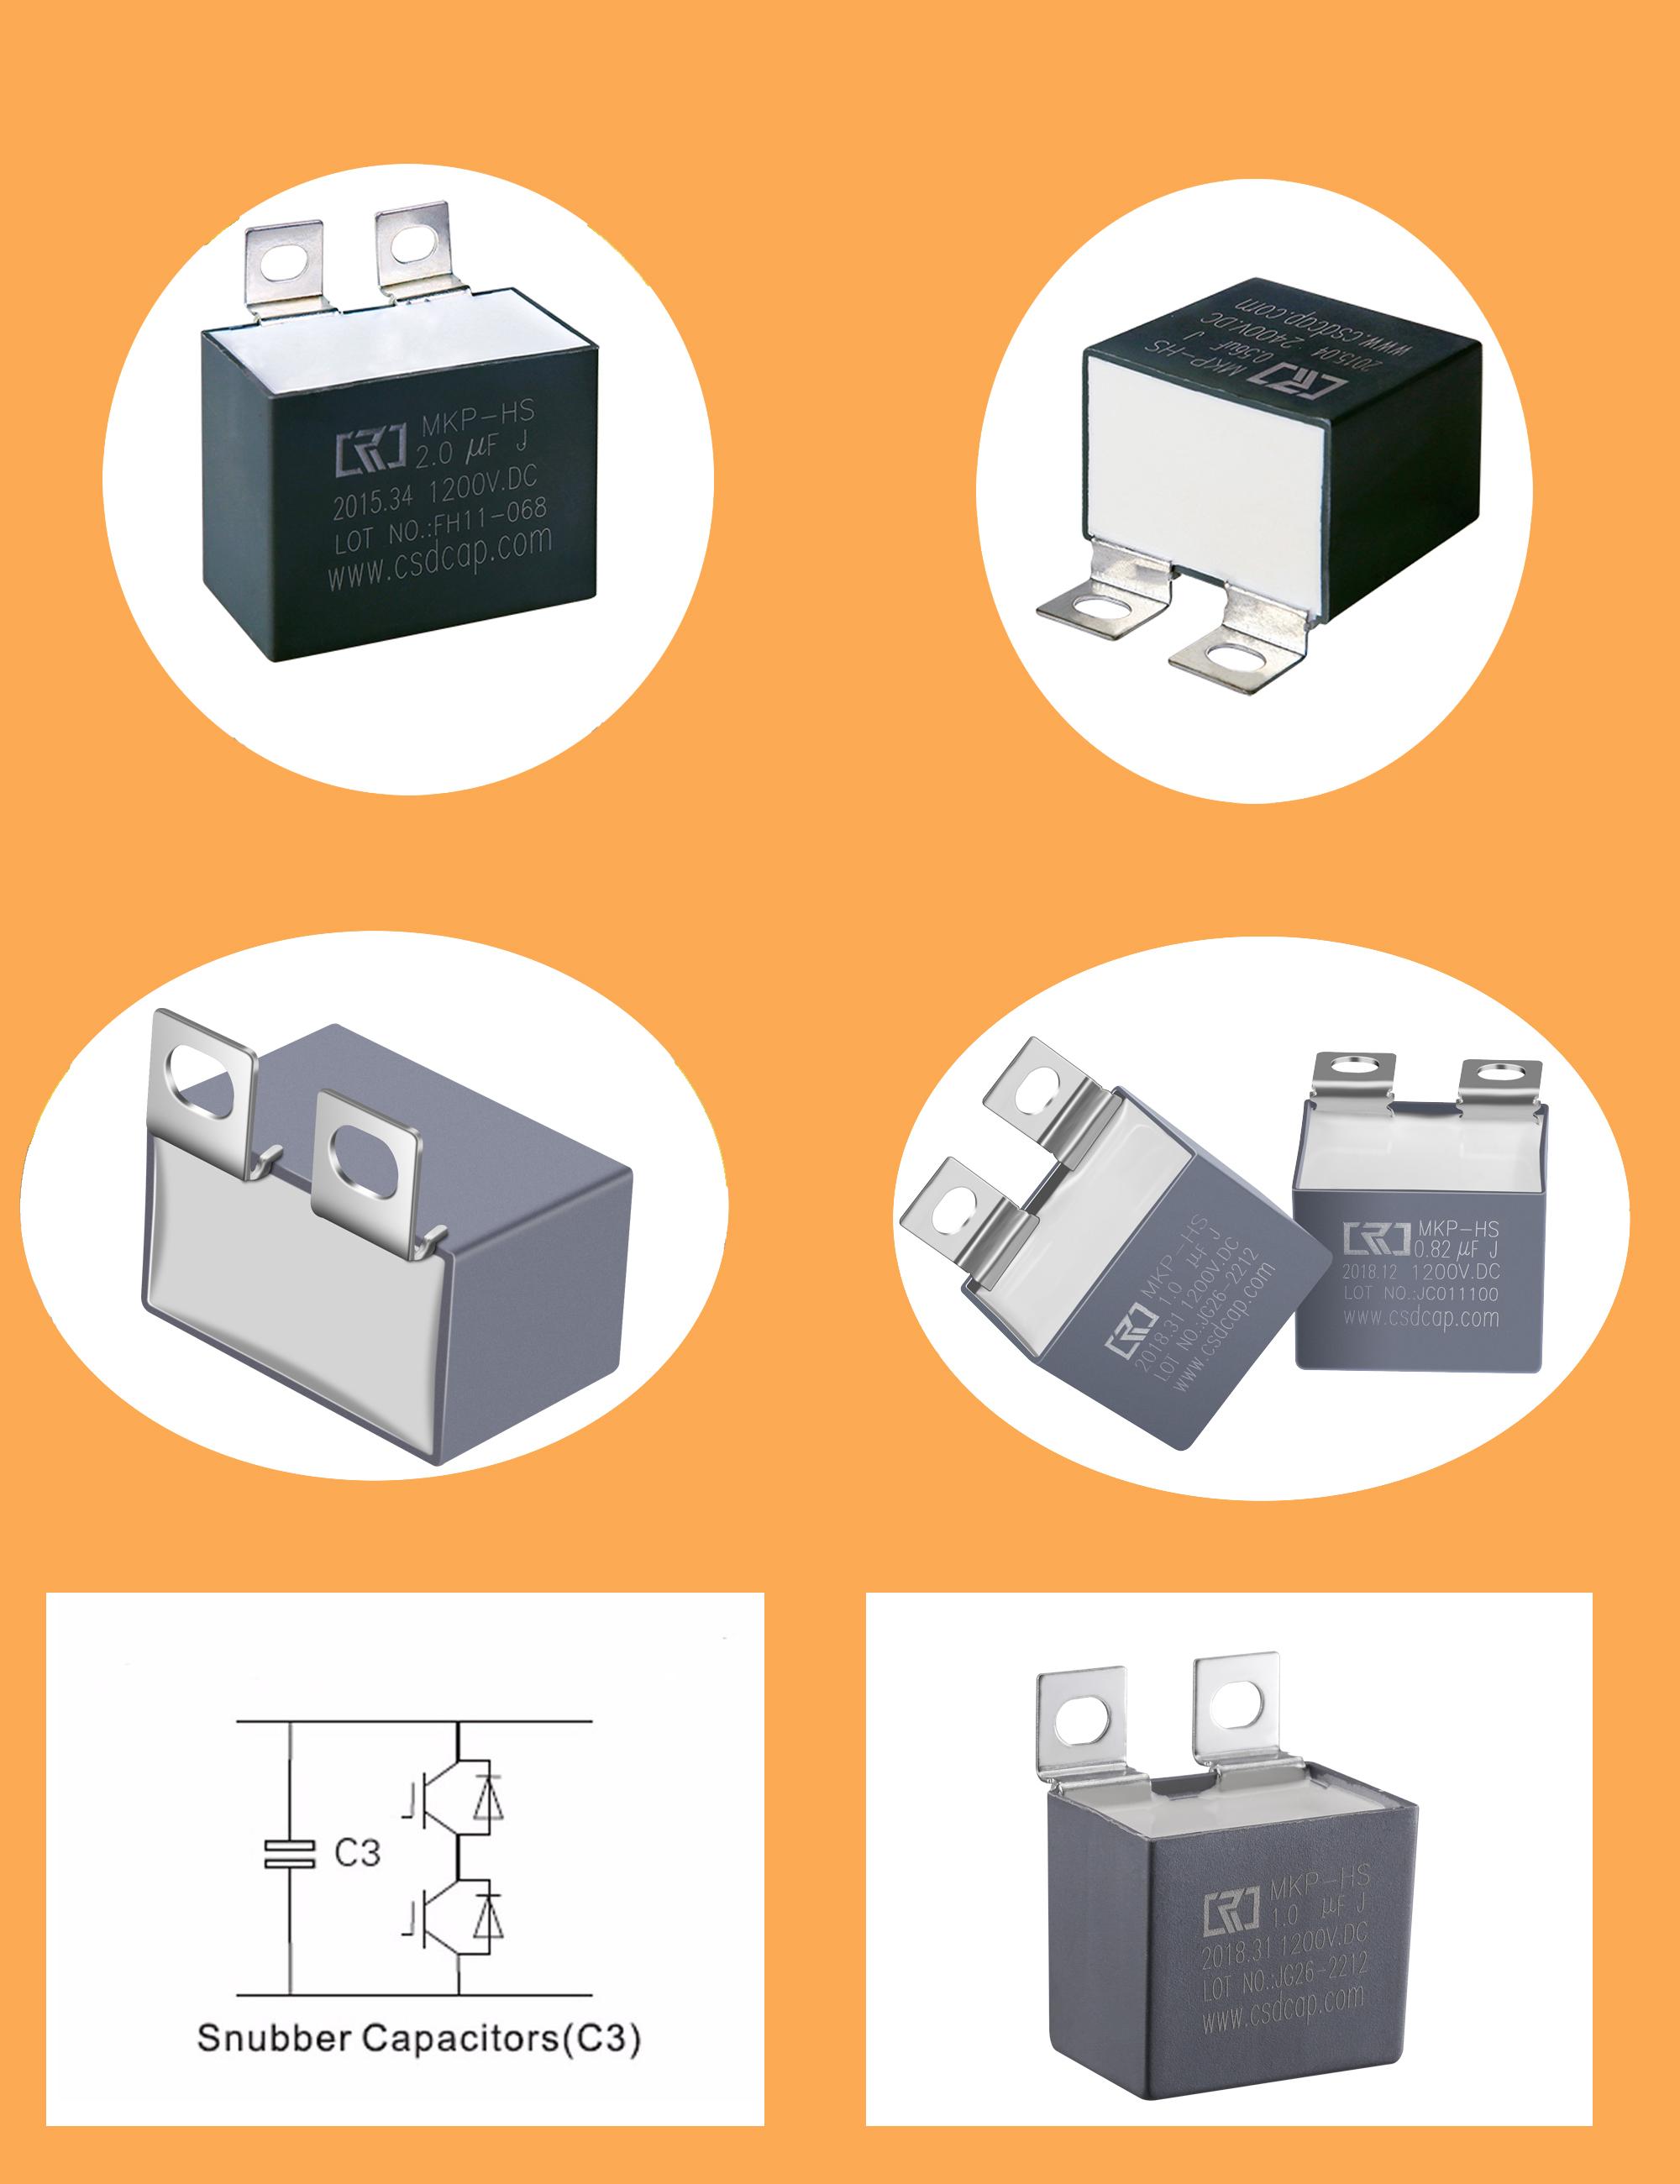 snubber capacitor hs.jpg